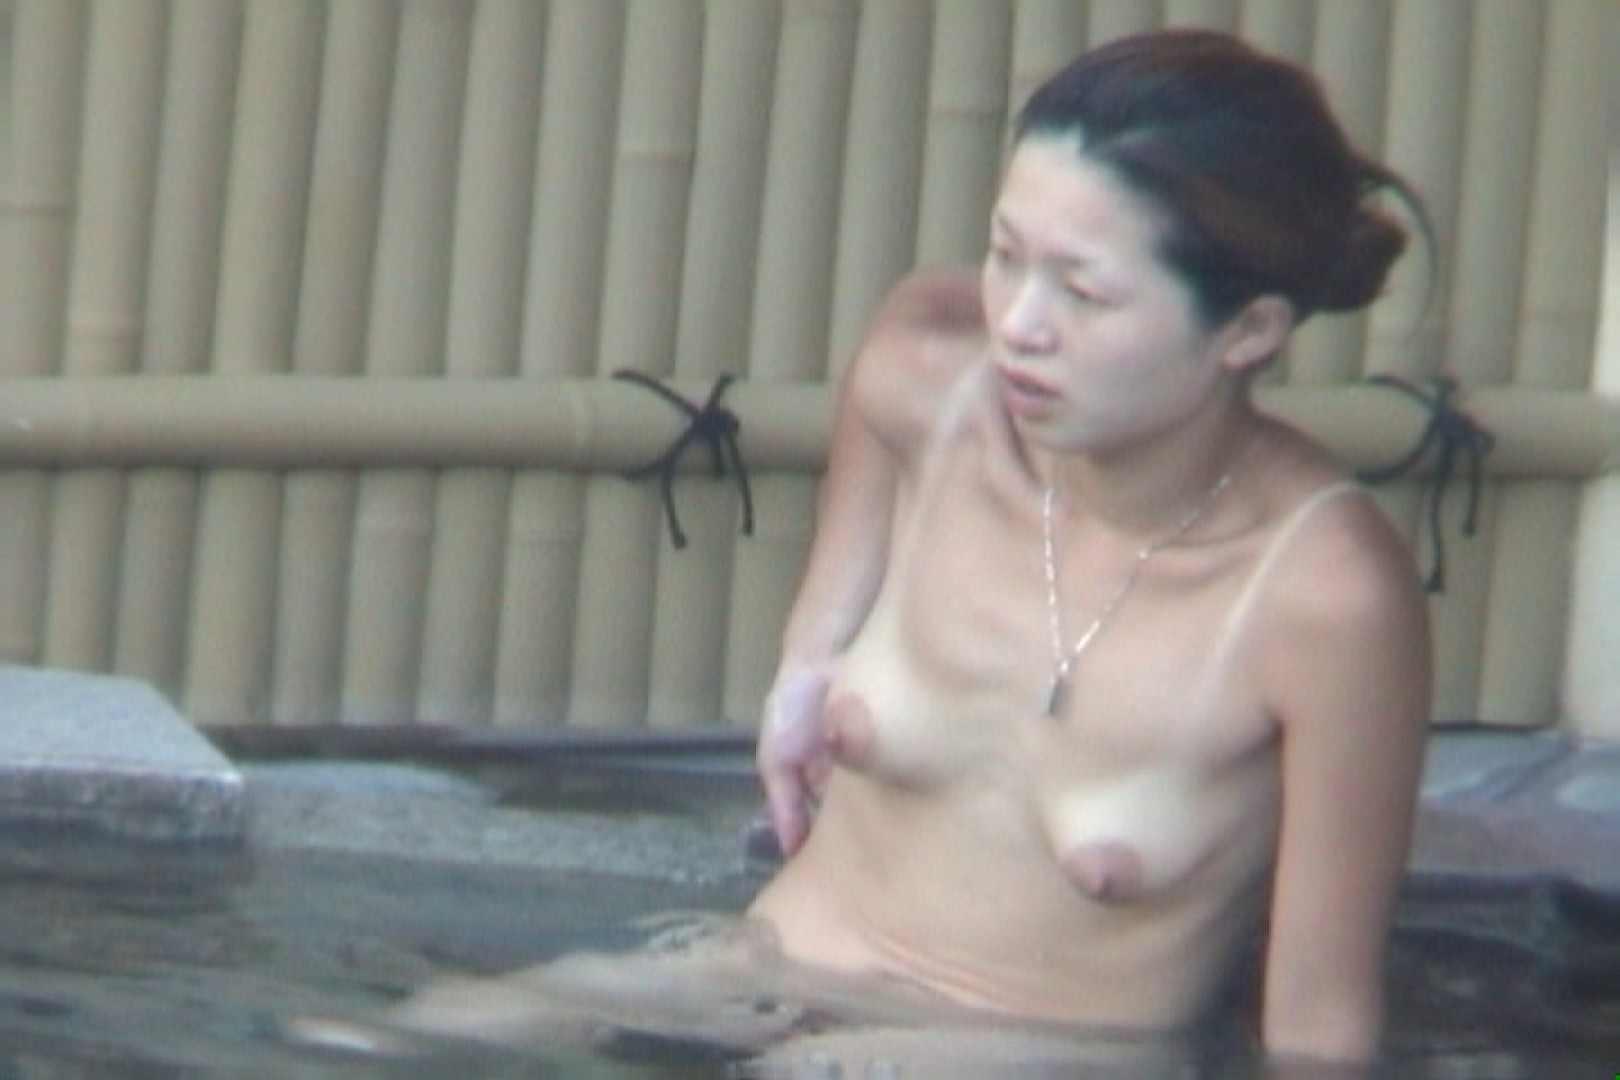 Aquaな露天風呂Vol.571 盗撮  81連発 6